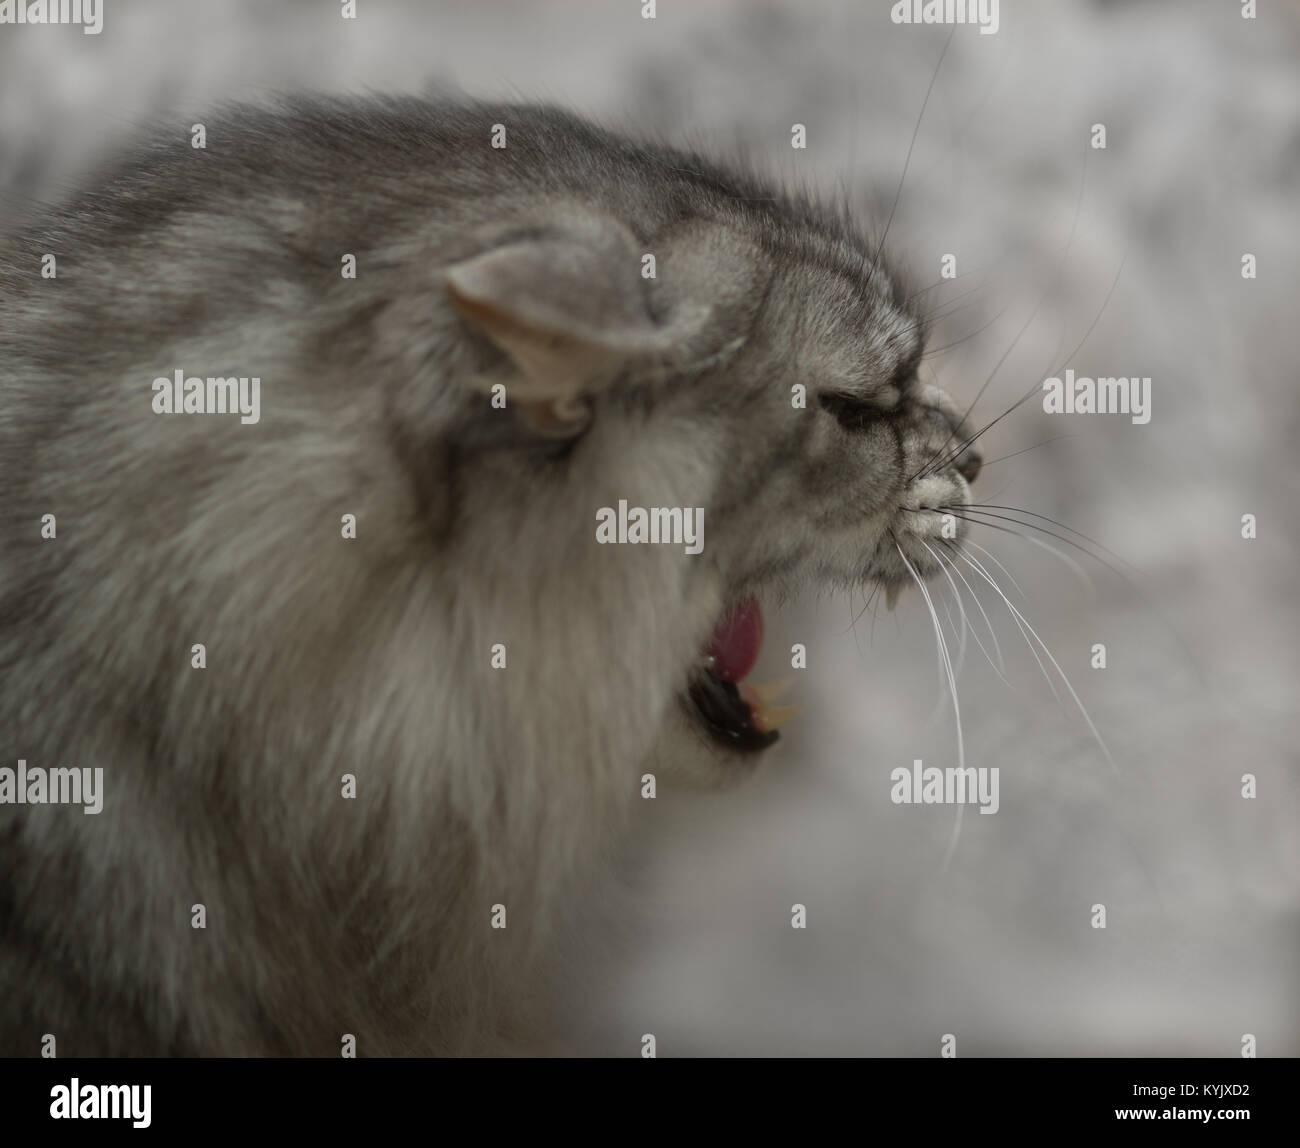 Angry cat closeup. The cat growls. - Stock Image